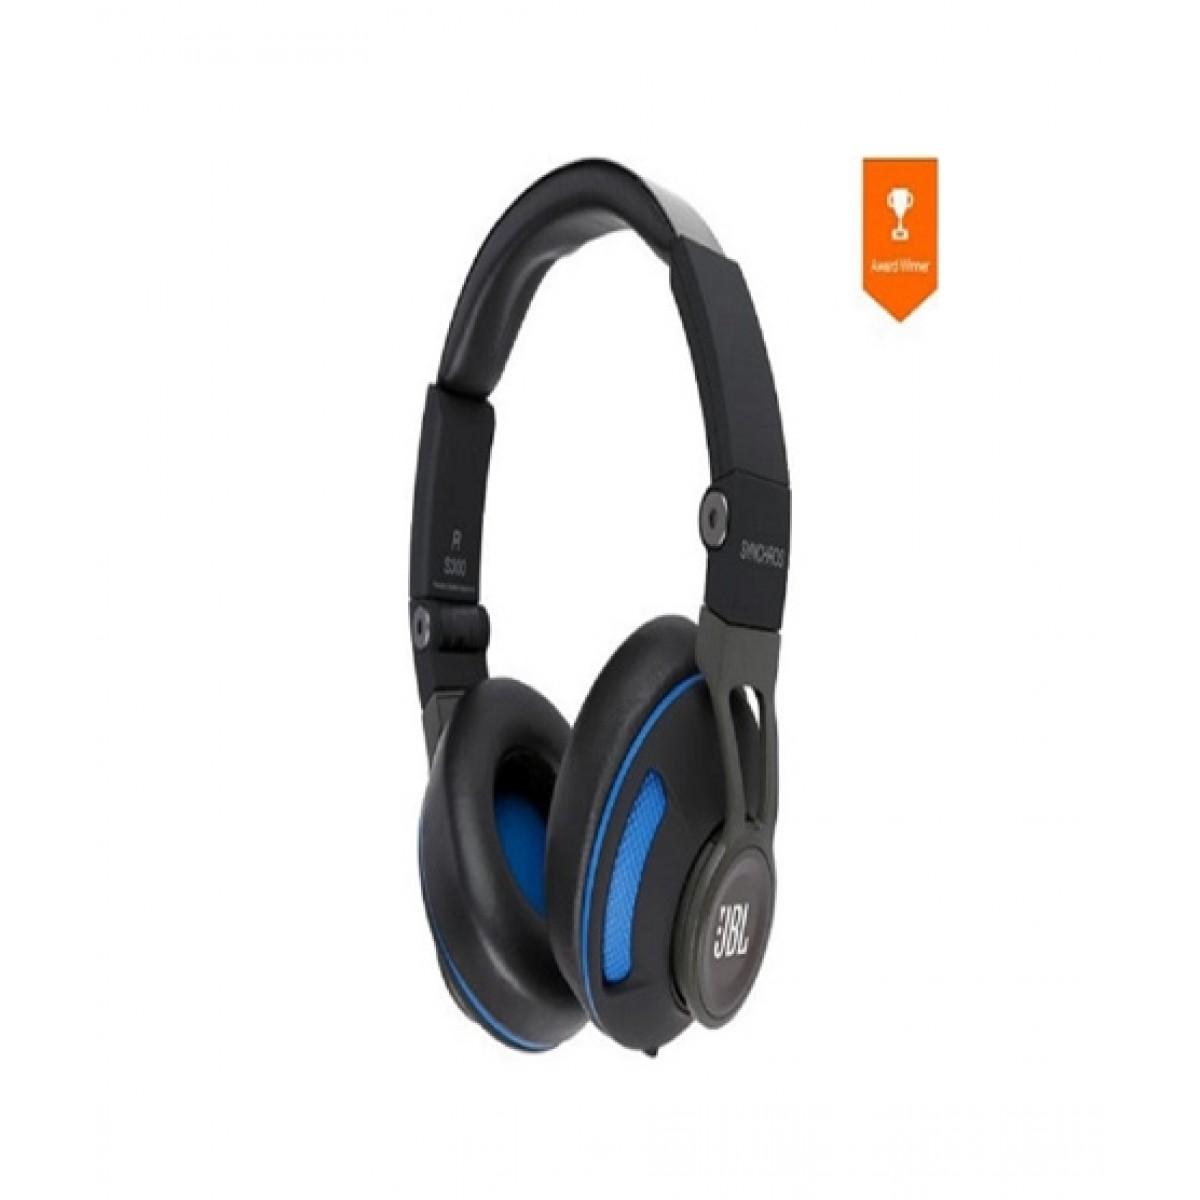 bcf4b522420 JBL Synchros S300 Premium Headphones Price in Pakistan | Buy JBL S300  Premium On-Ear Headphones Black/Blue | iShopping.pk